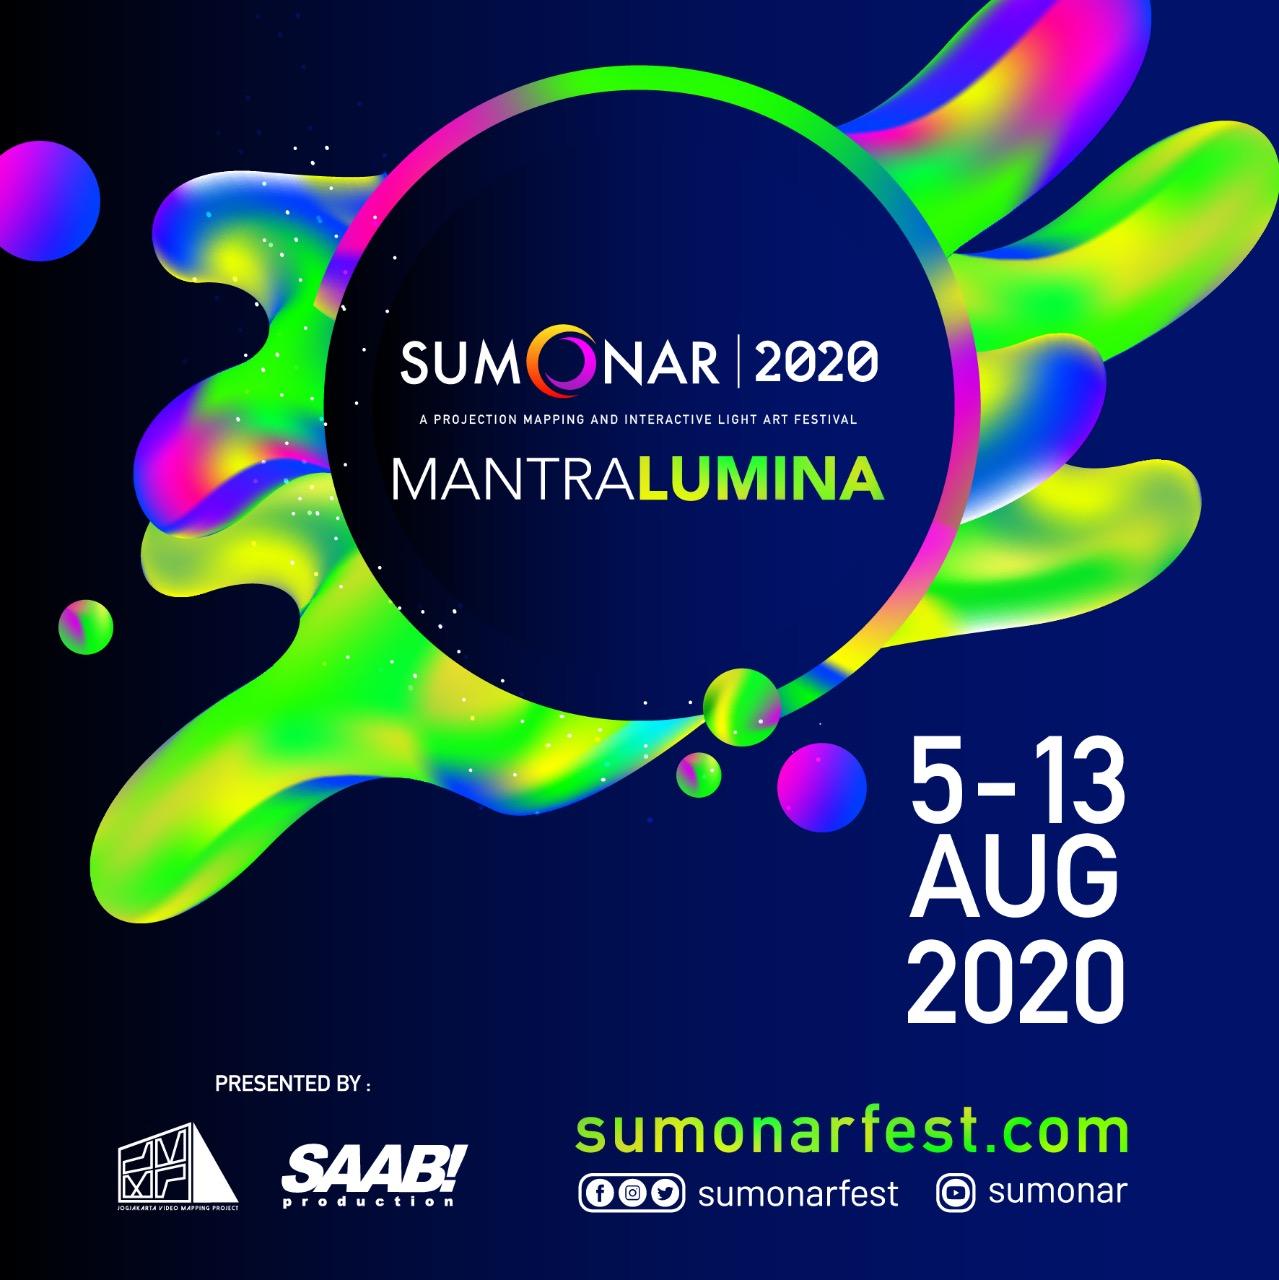 SUMONAR 2020 : Mantra Lumina, Harapan Terbaik Melalui Cahaya